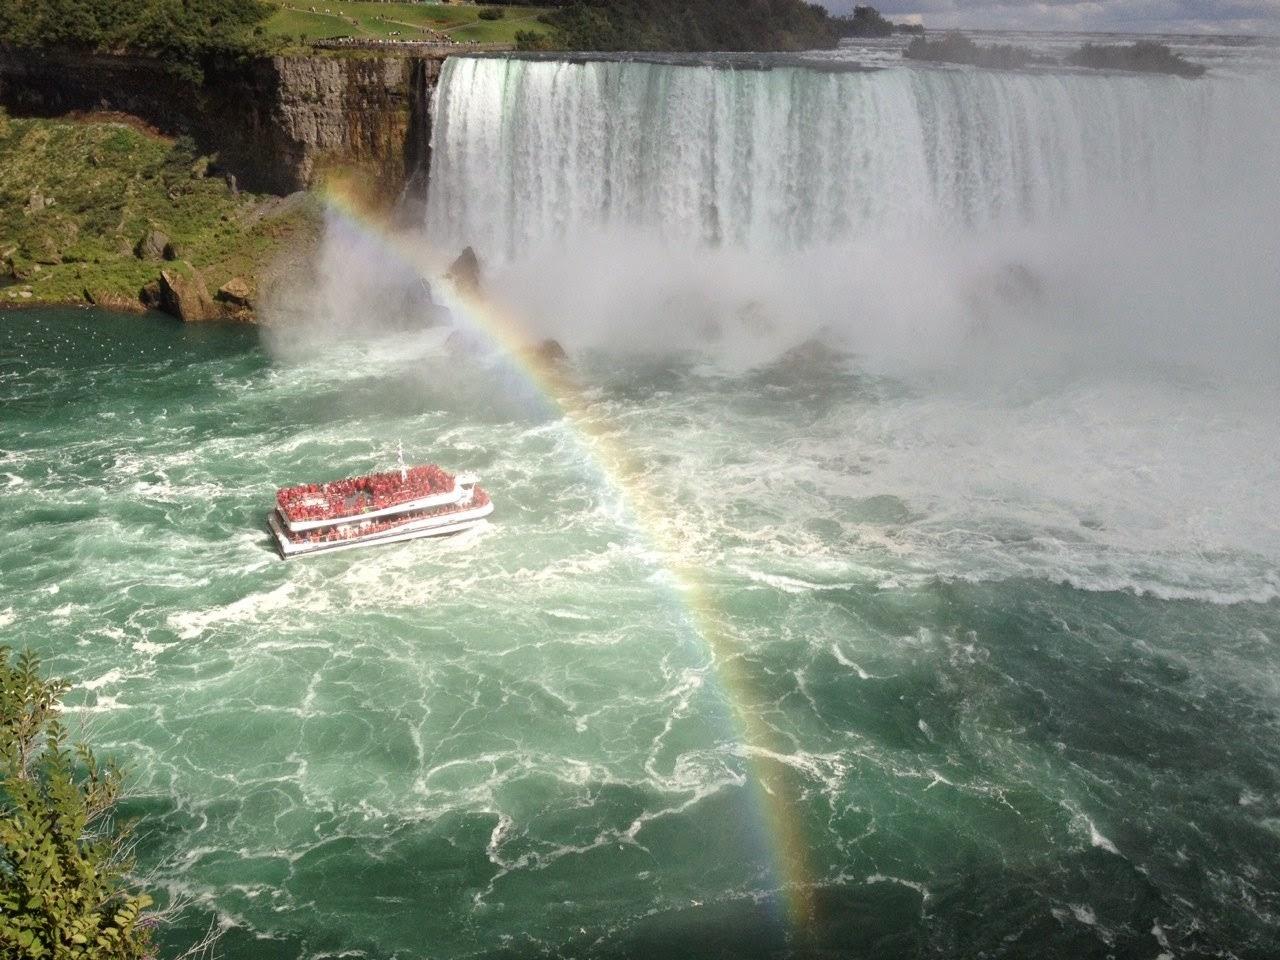 Blue Nile Falls Wallpaper Ferry Heading Towards Niagara Falls With Rainbow Boat